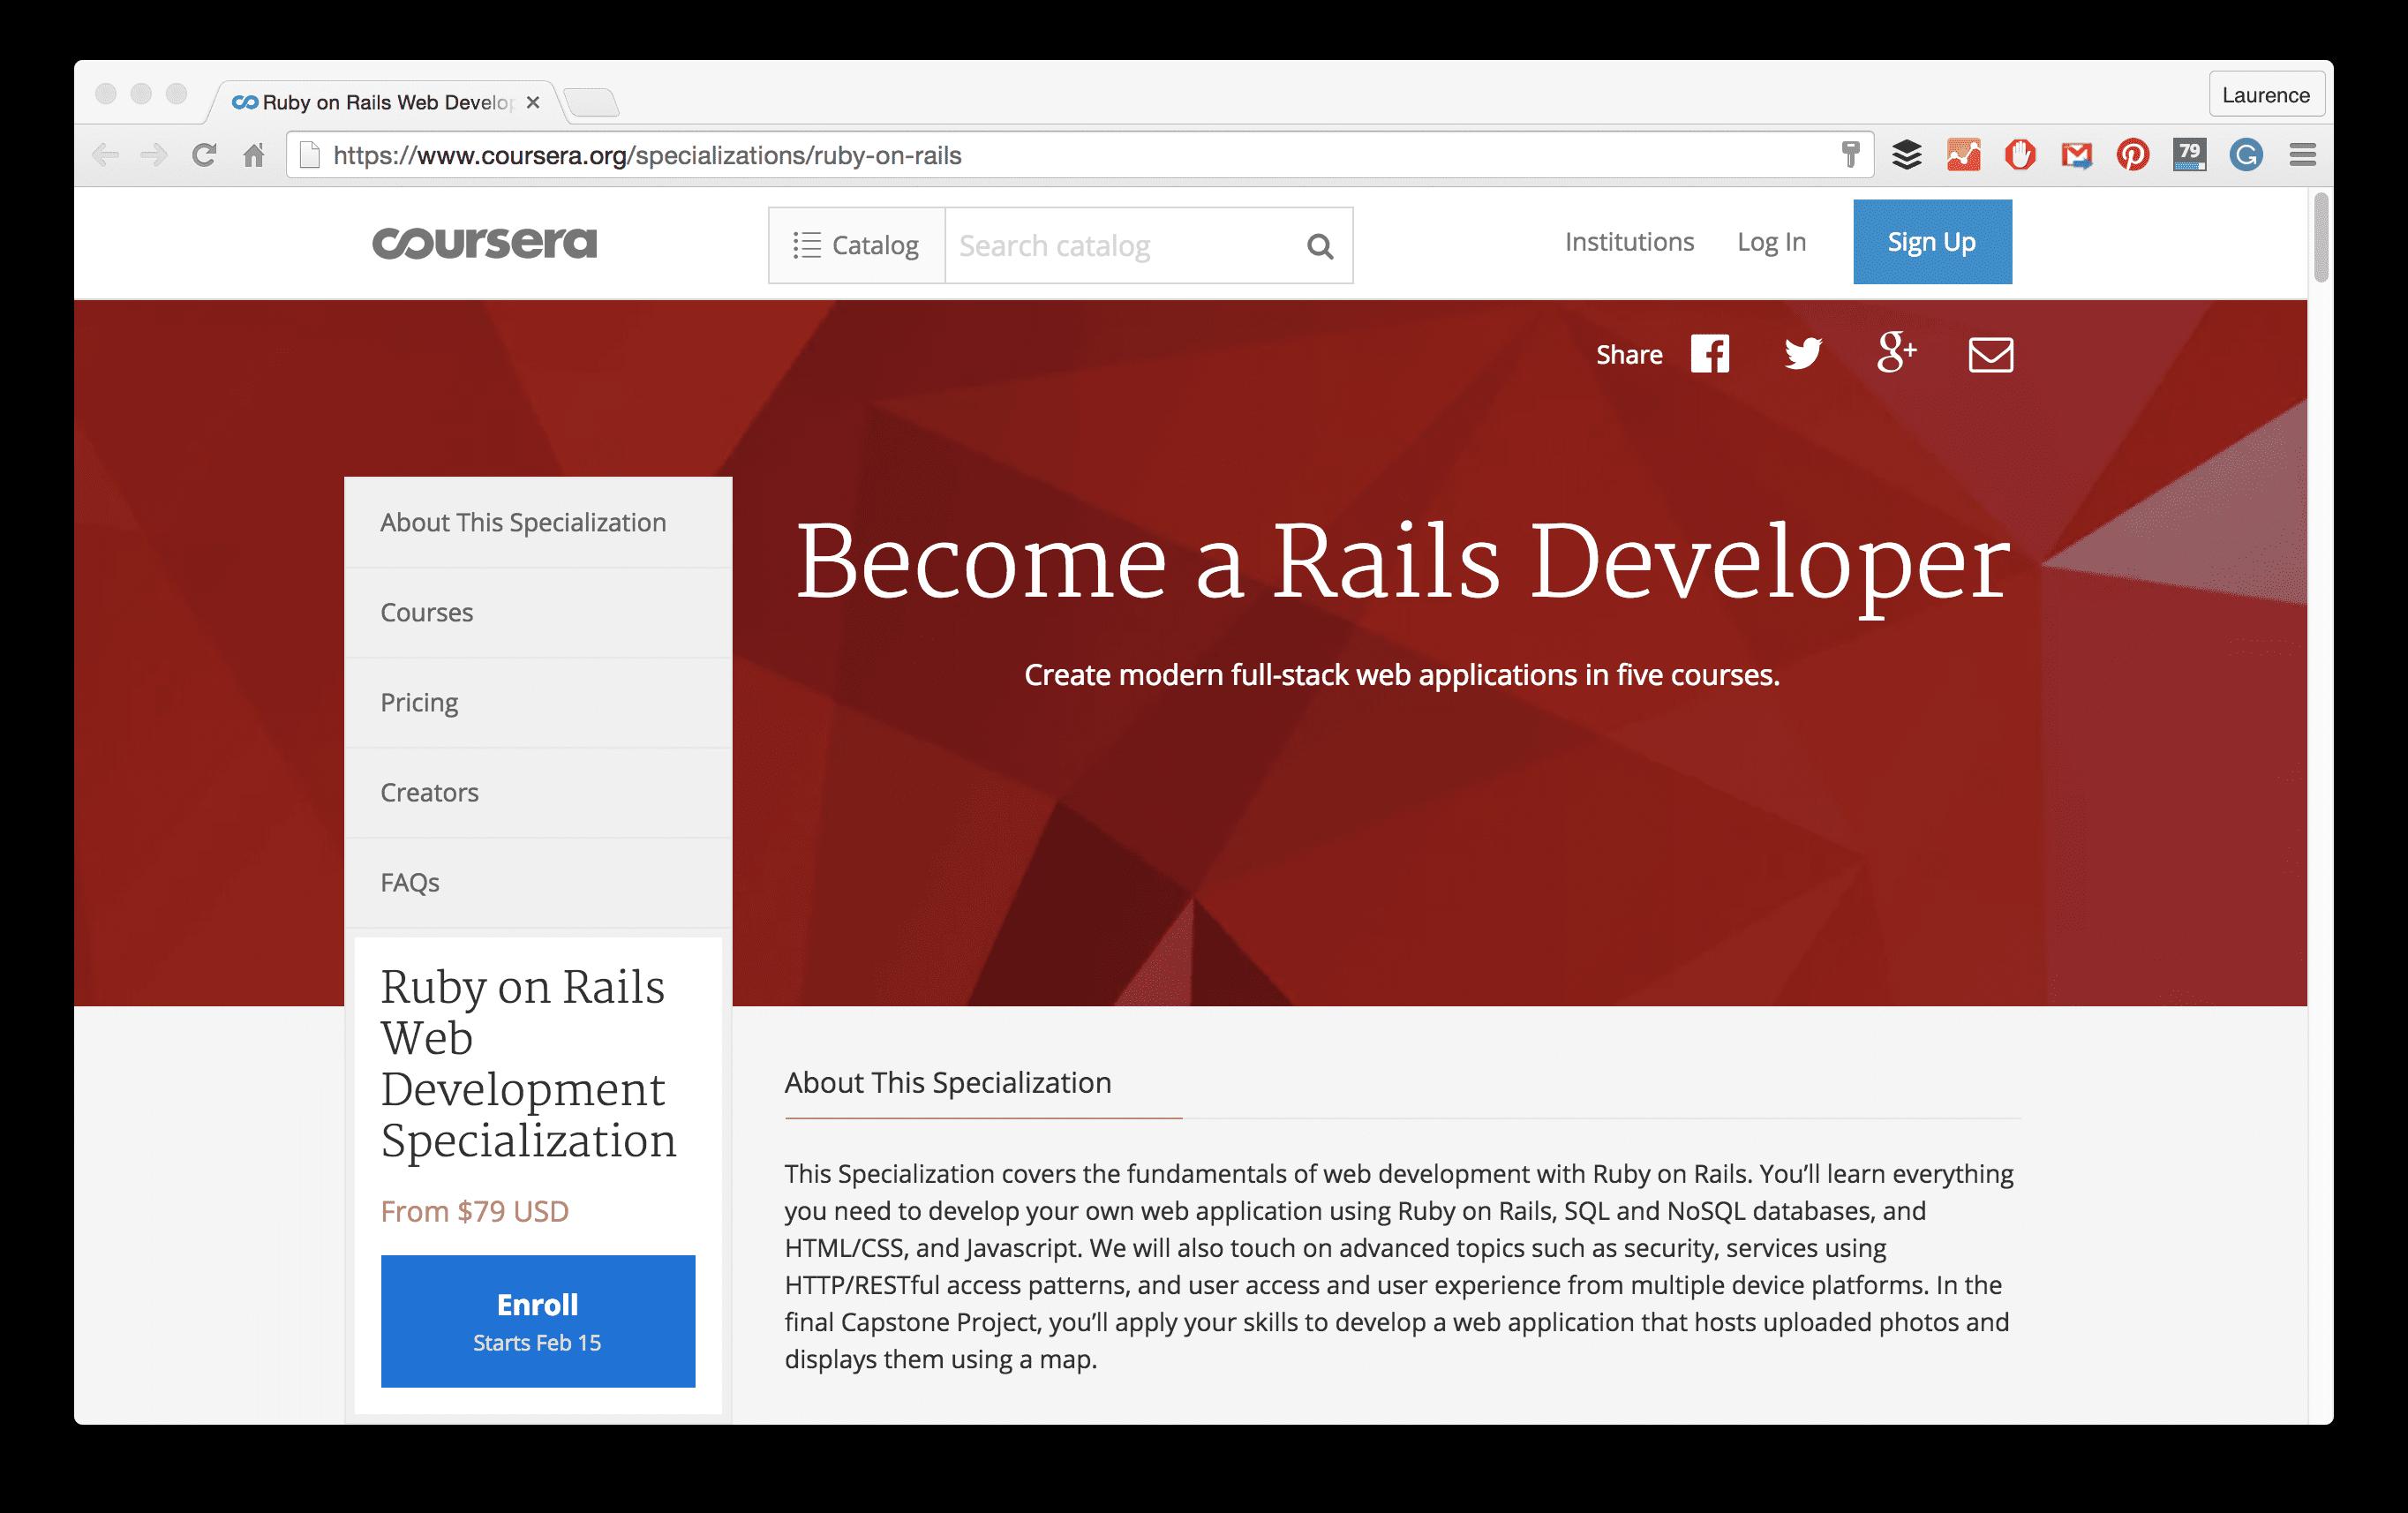 ruby on rails specialization